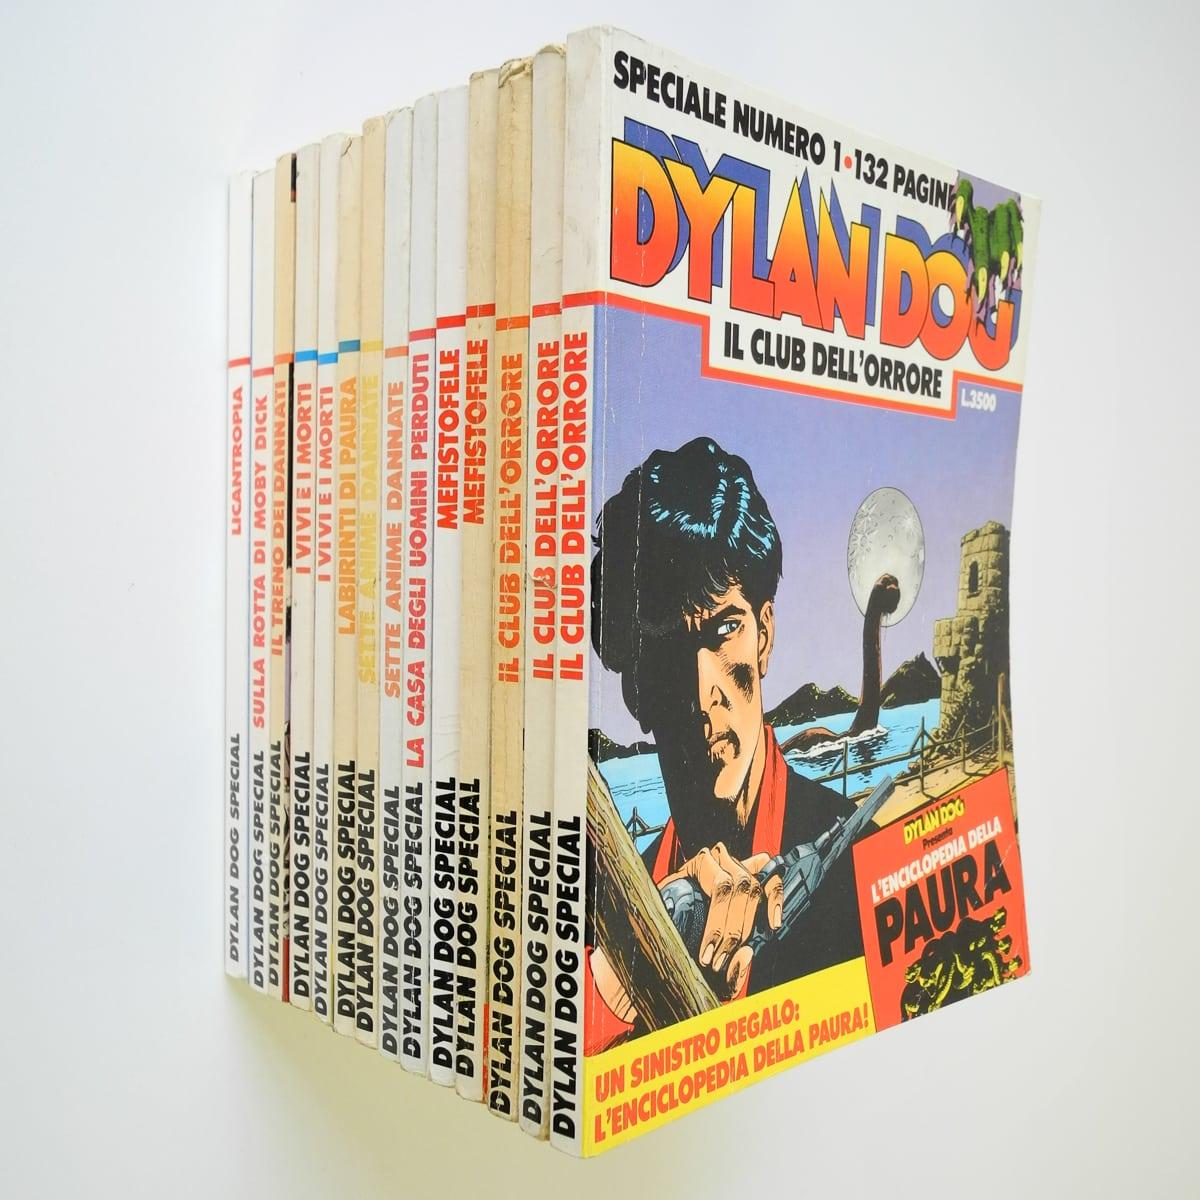 Dylan Dog speciale singoli originali